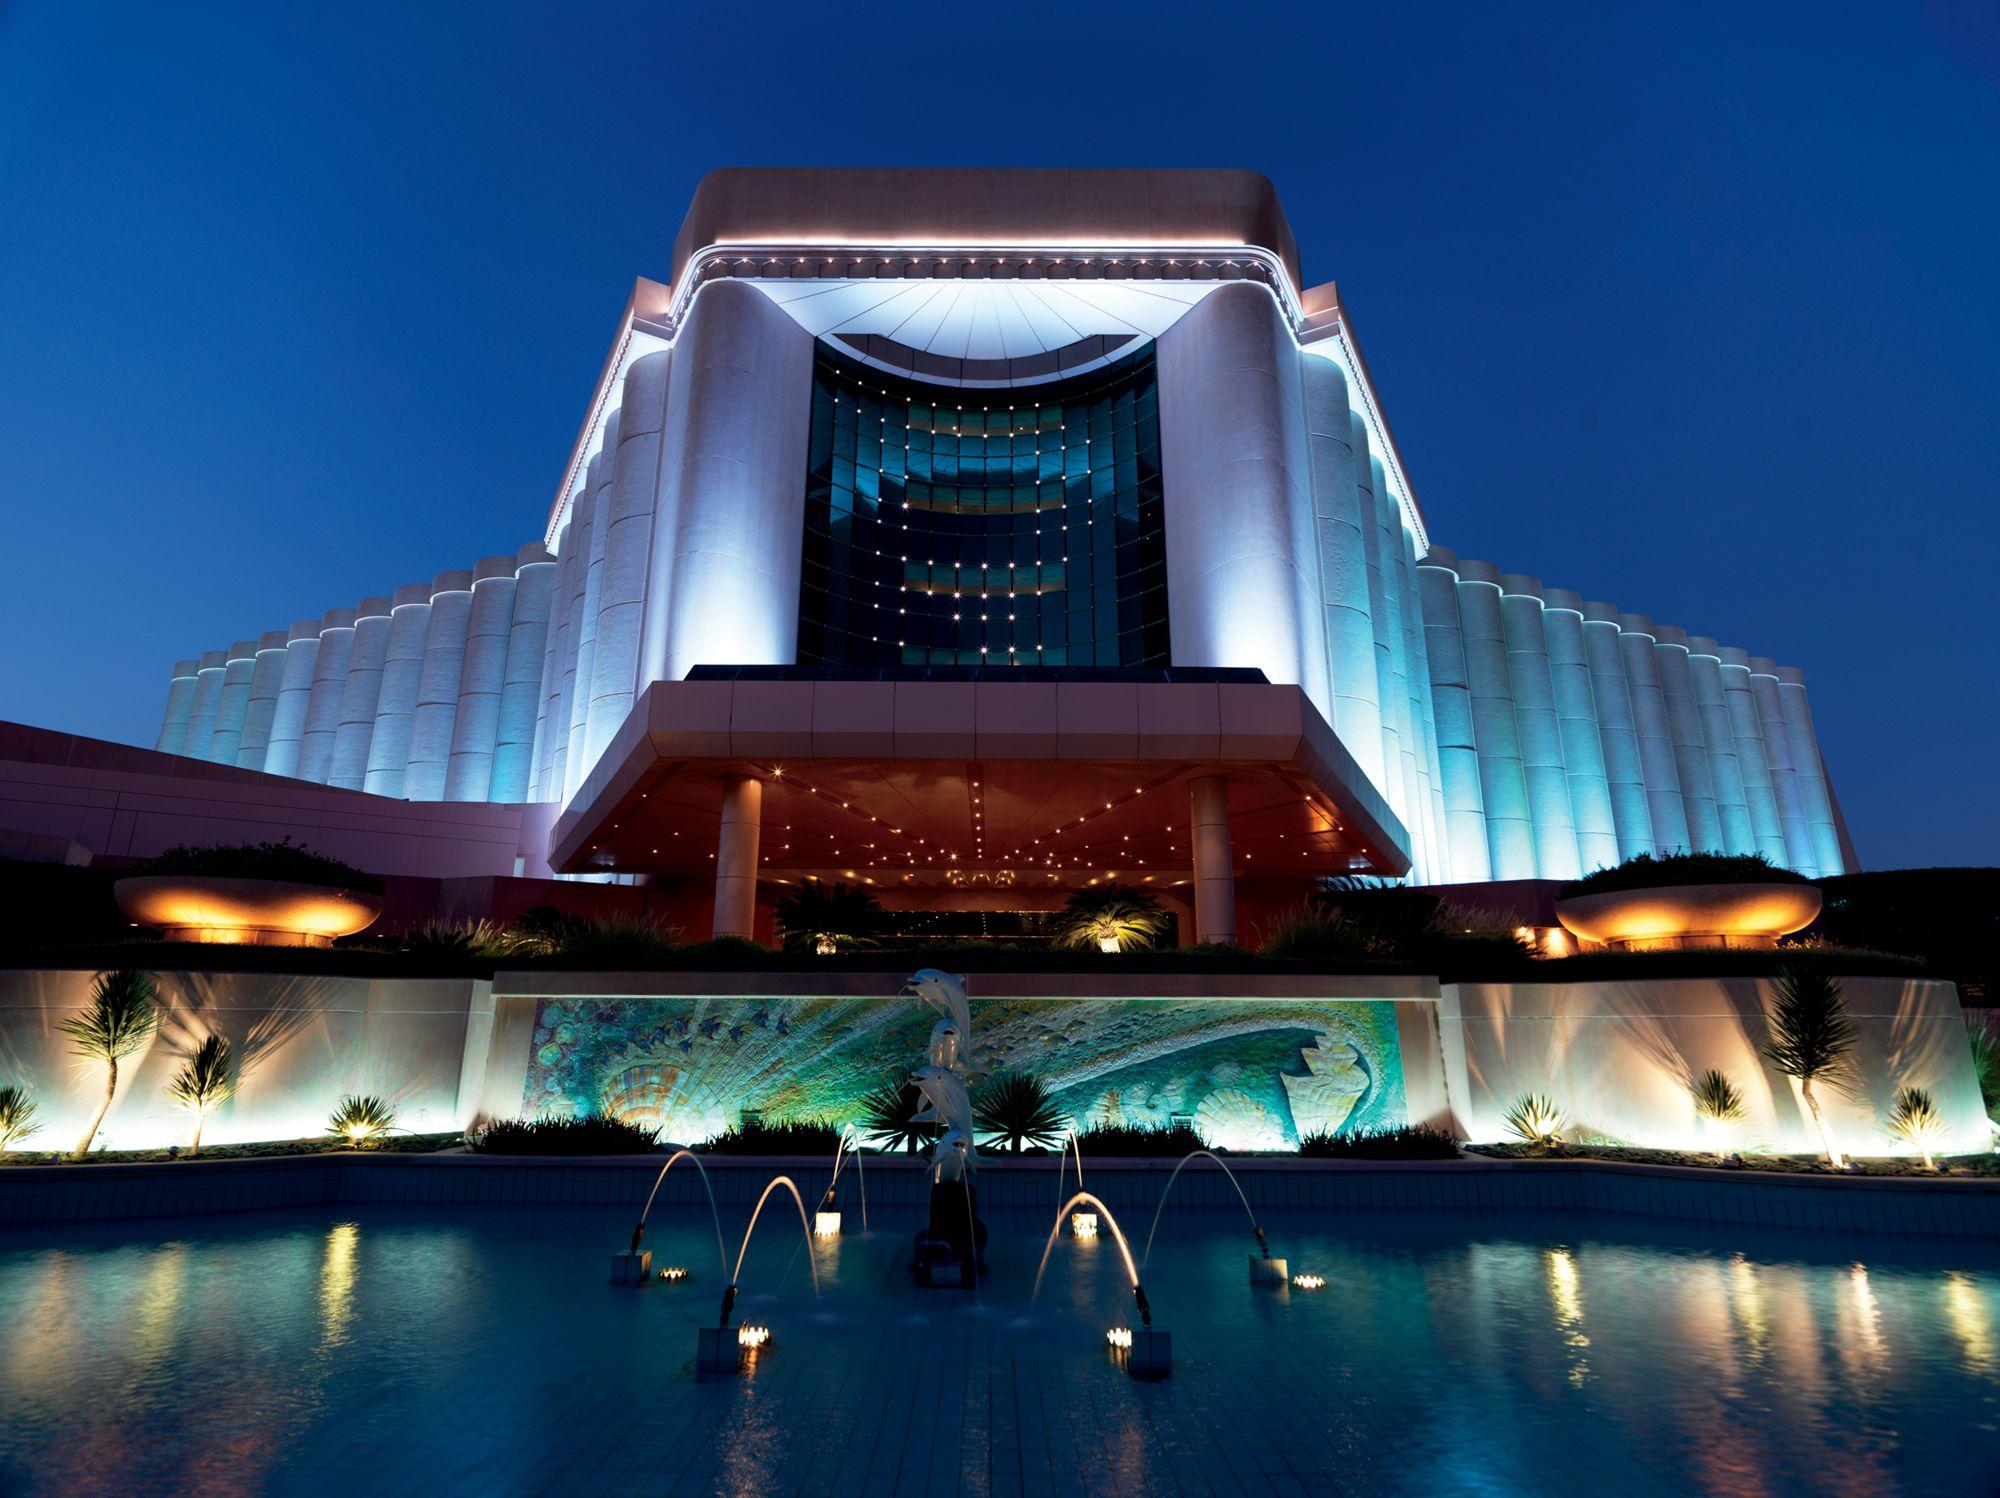 Luxury City Resort in Manama Bahrain | The Ritz-Carlton, Bahrain